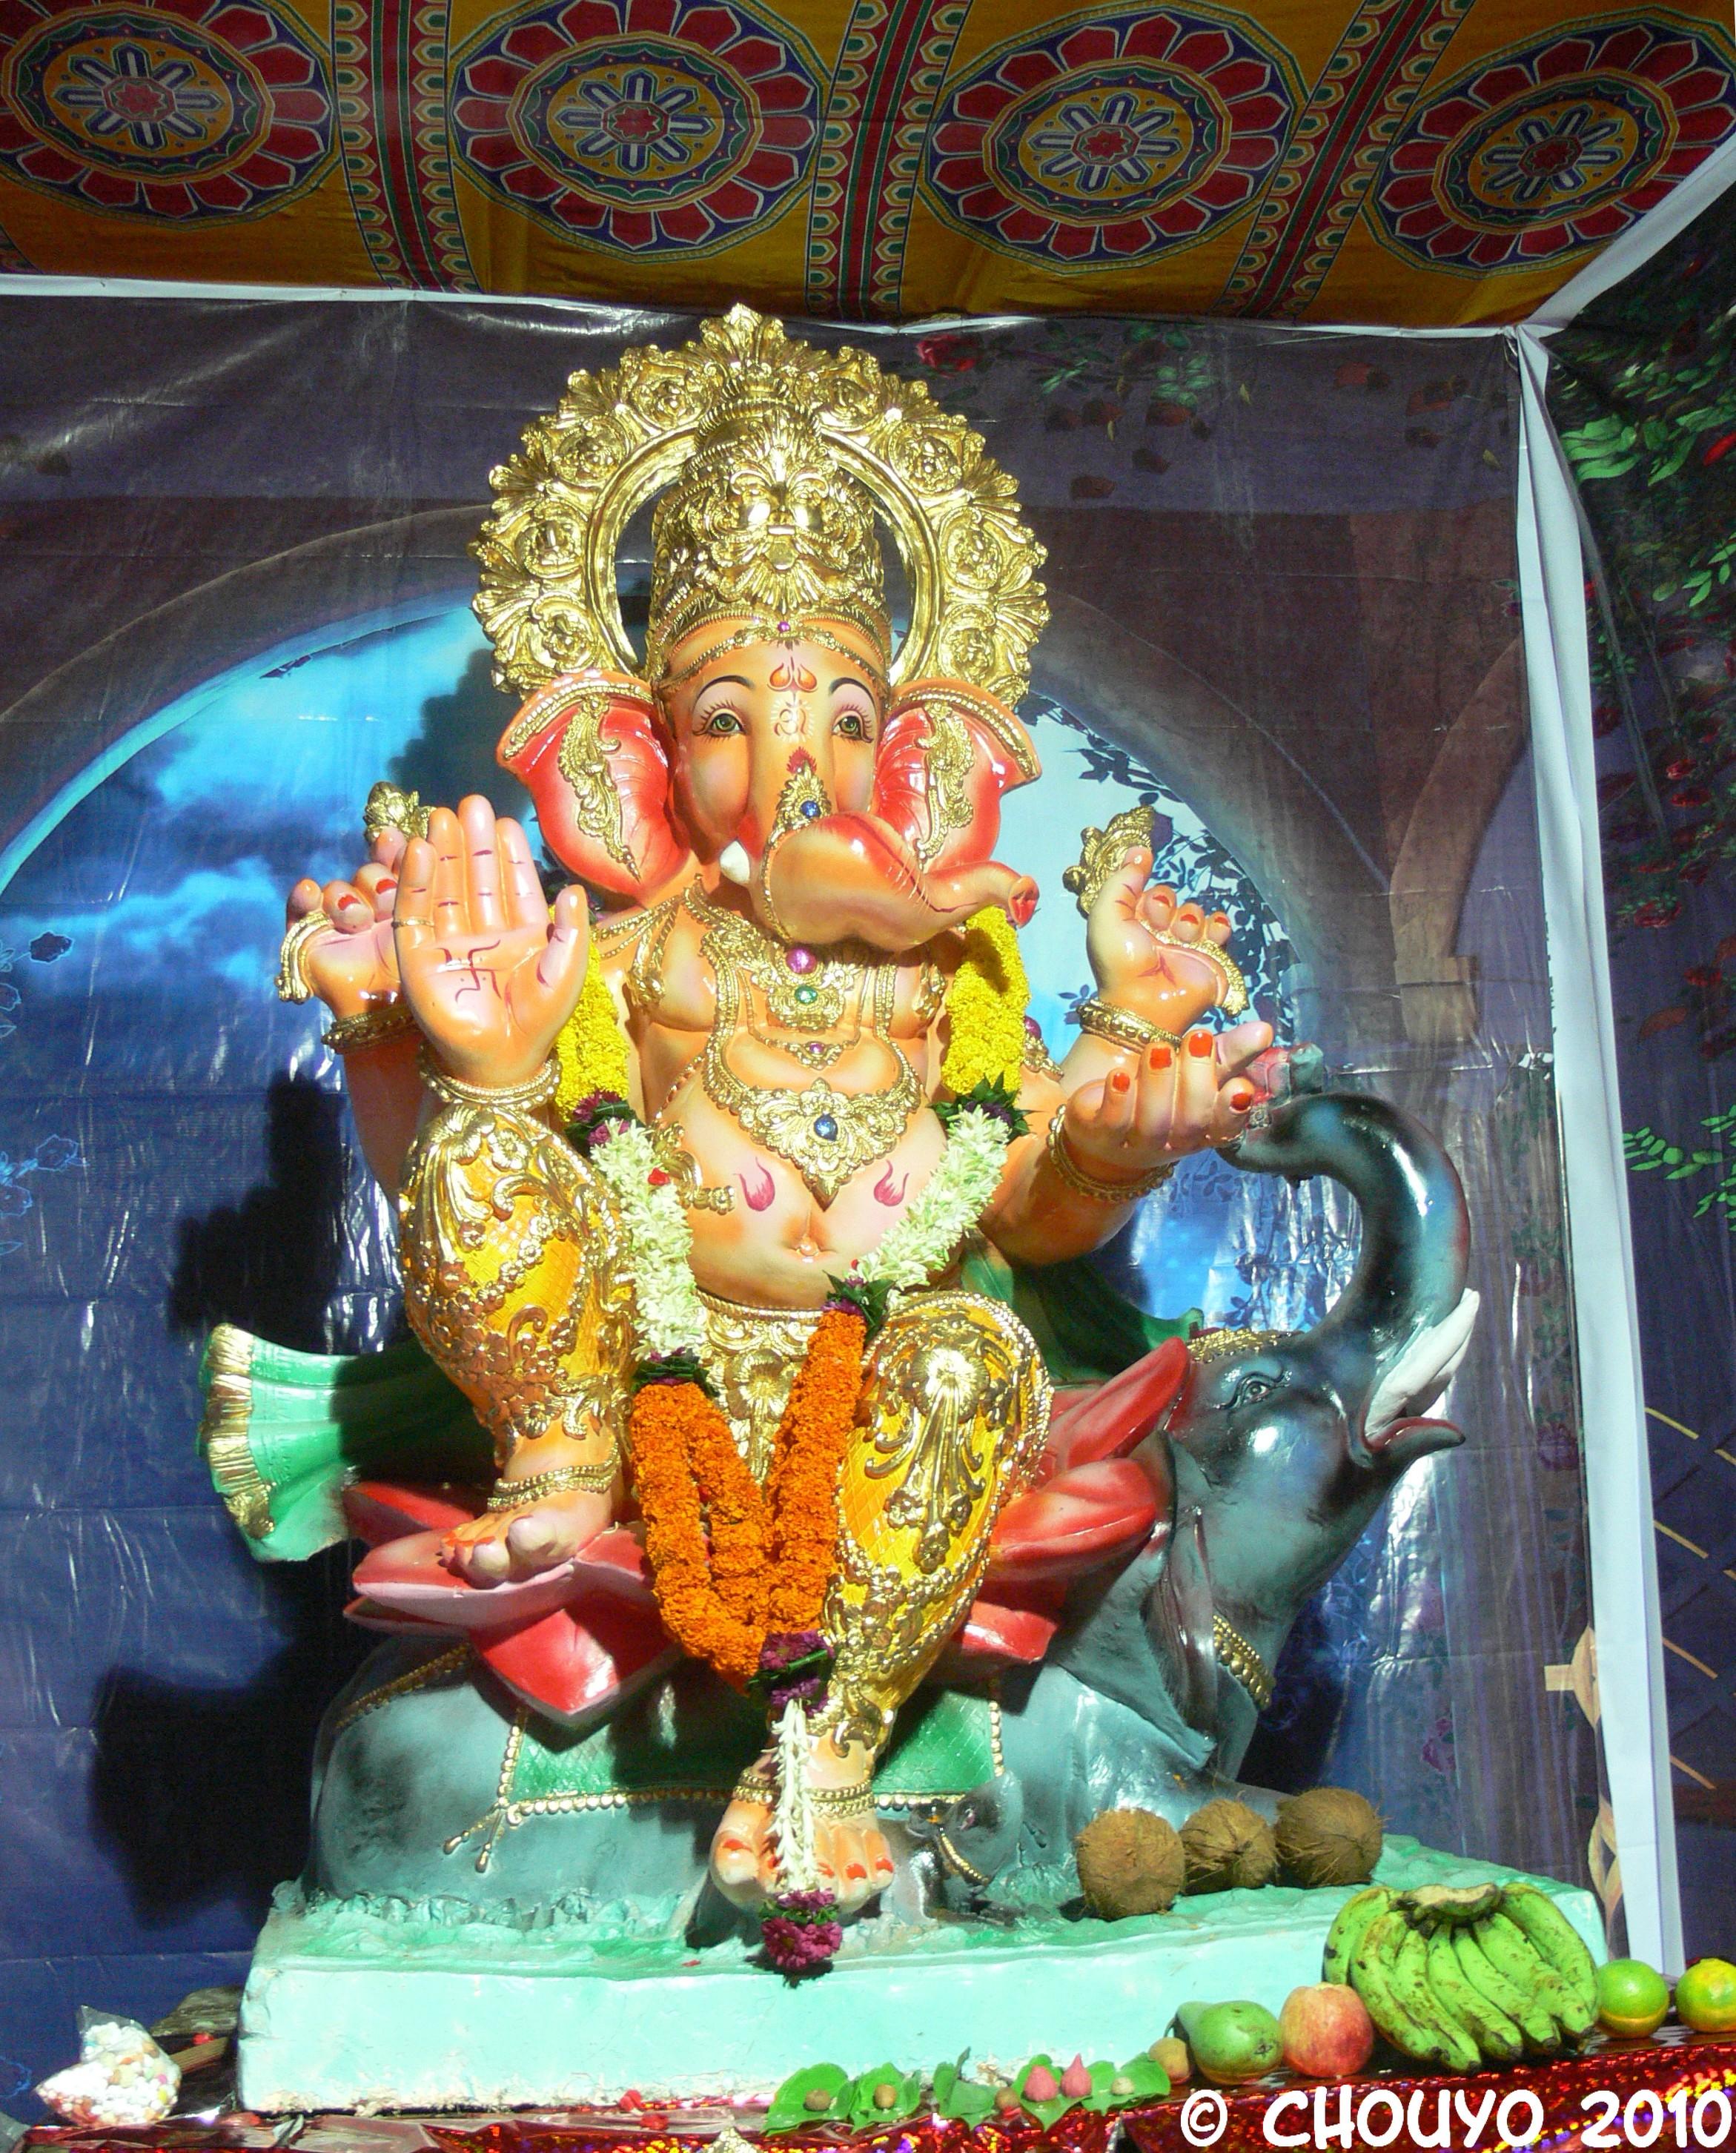 Ganesh Chaturthi 2010